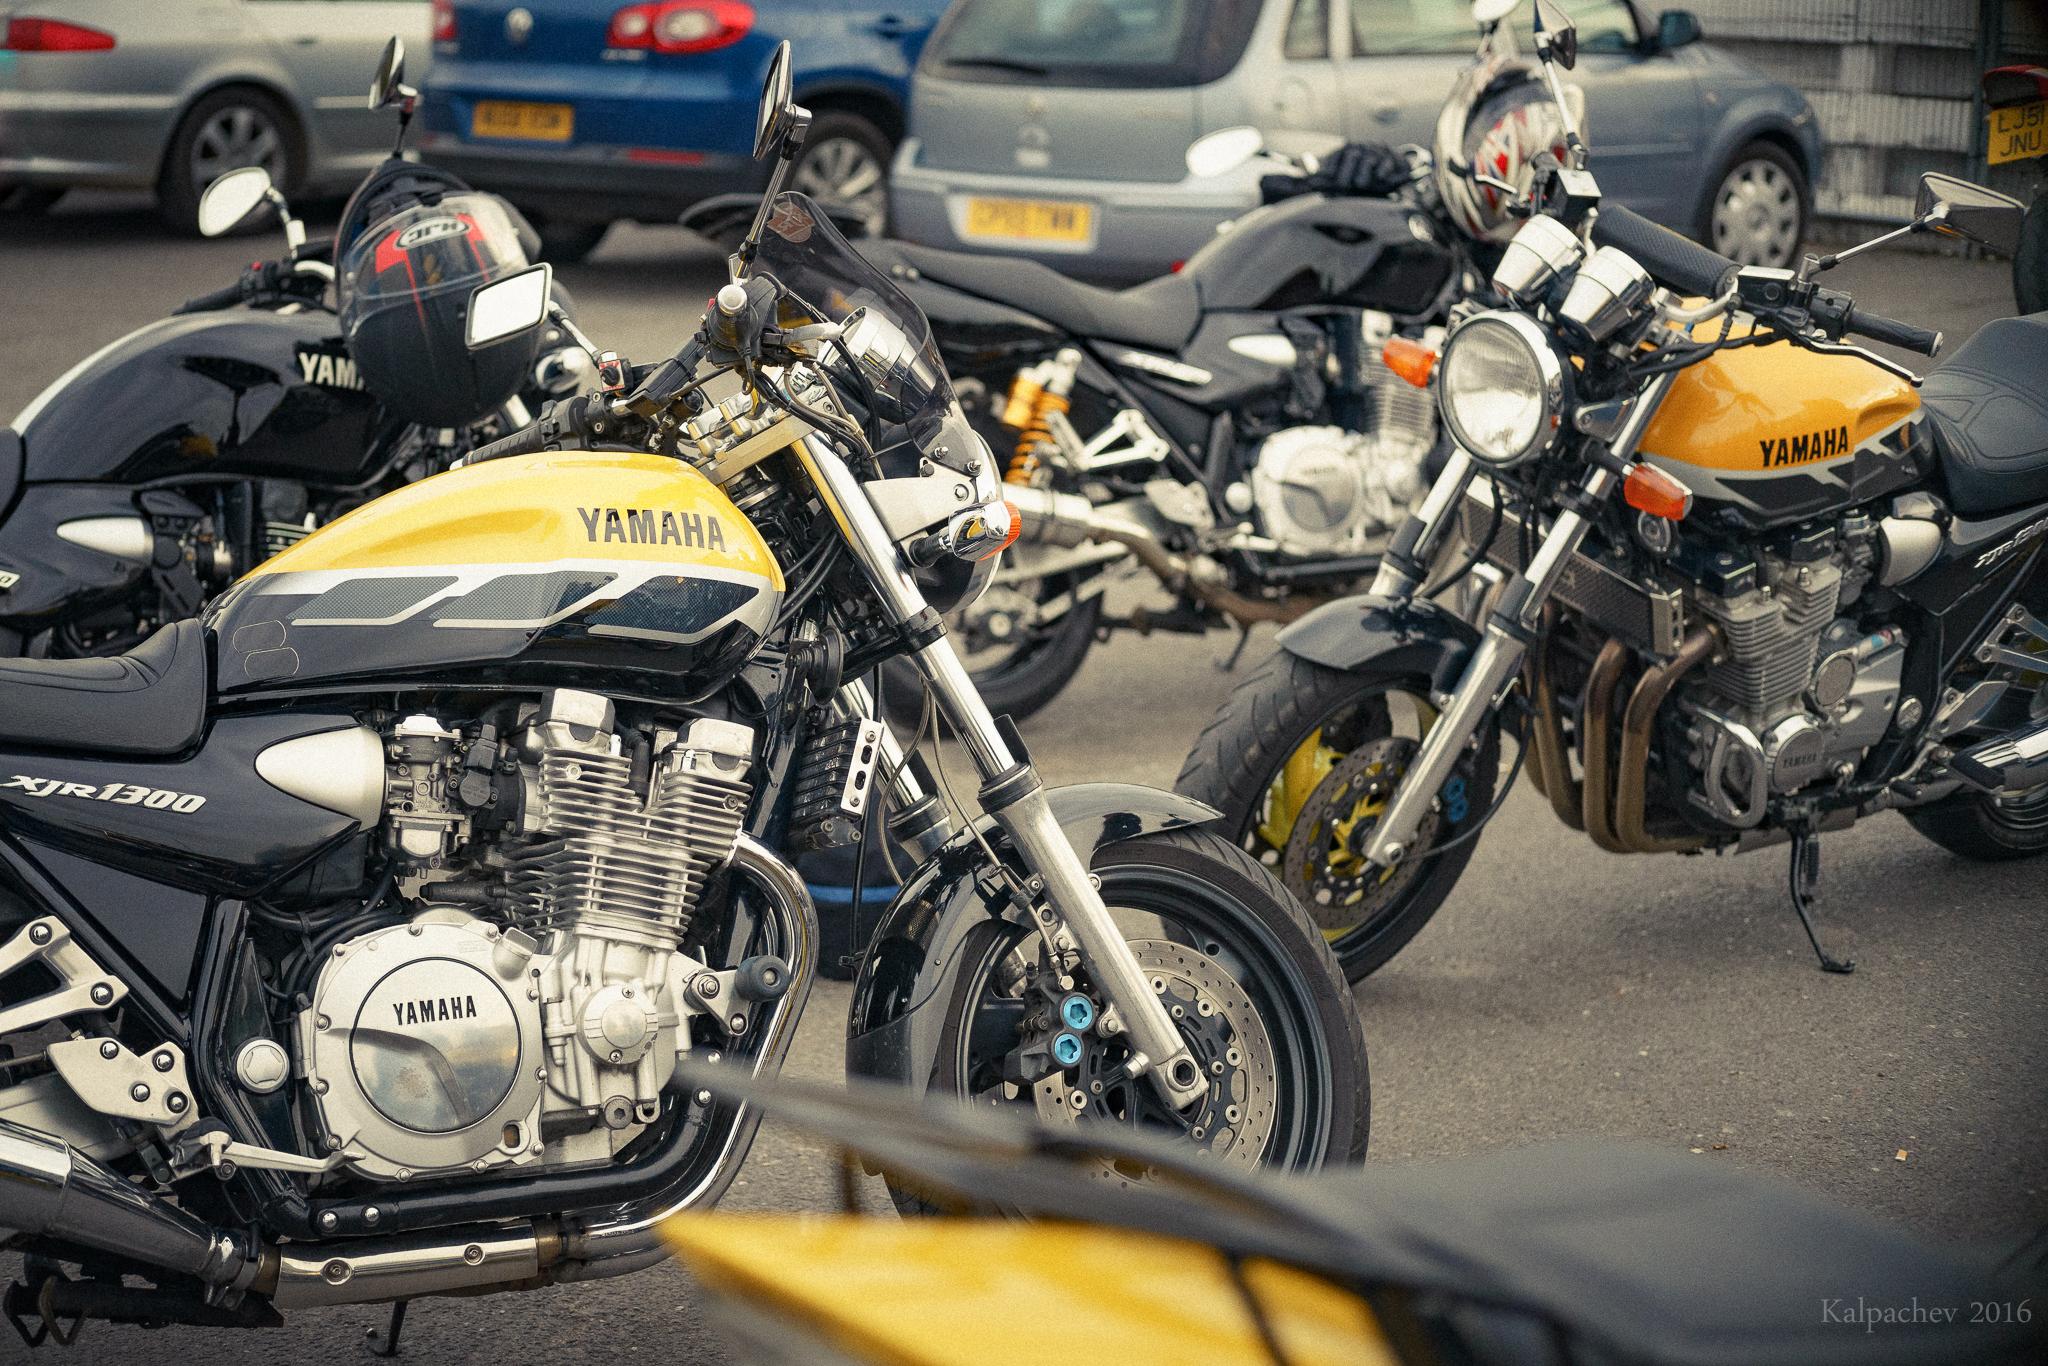 Yamaha xjr 1300 at Ace Cafe London